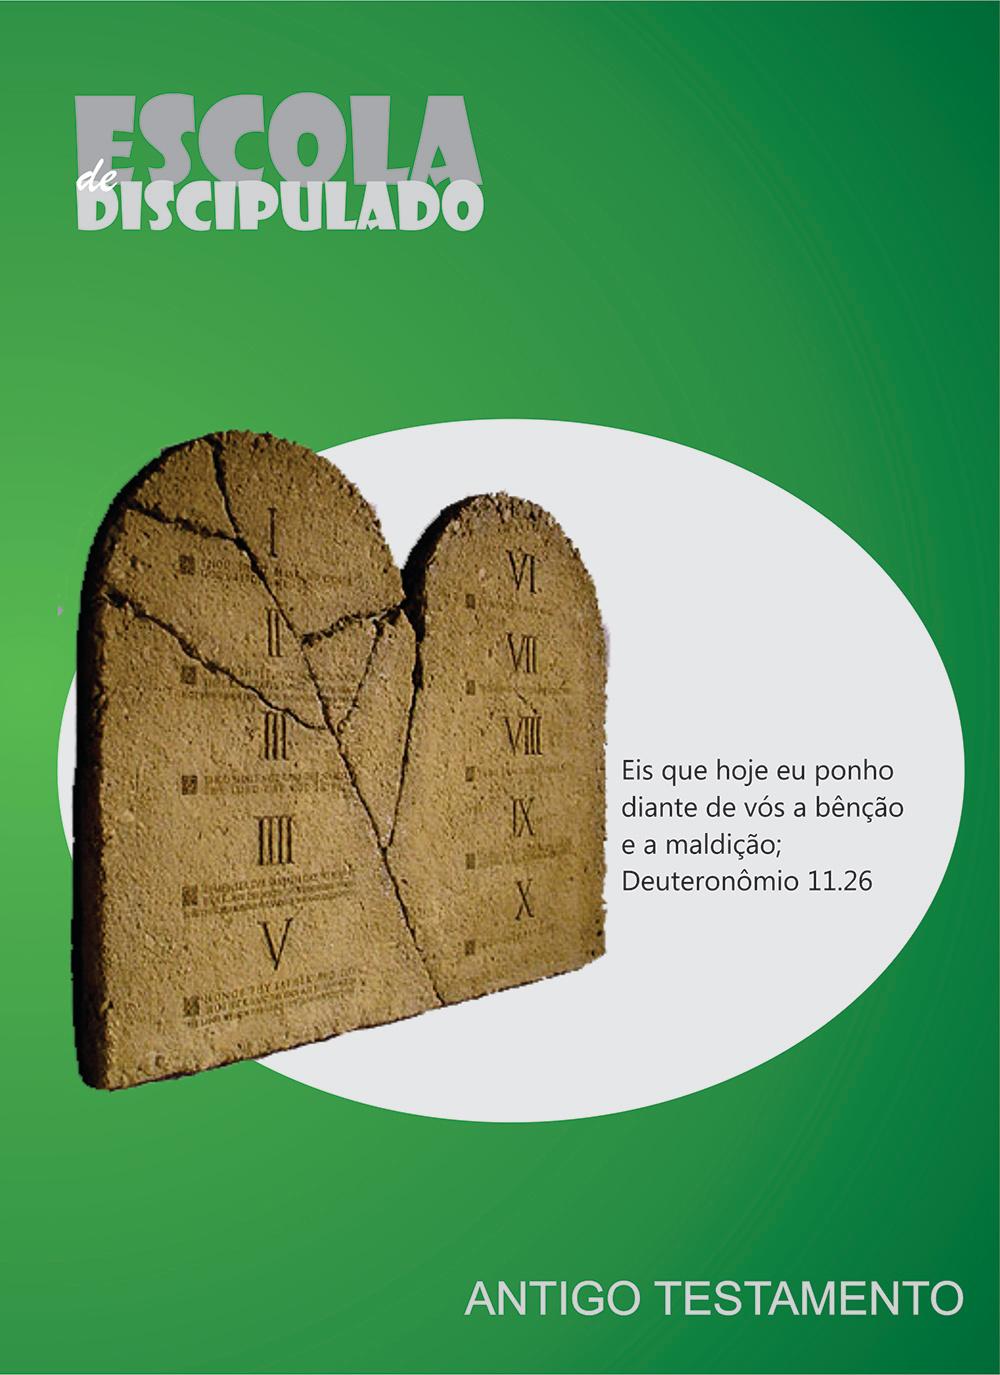 DISCIPULADO  - CAPA - ANTIGO TESTAMENTO